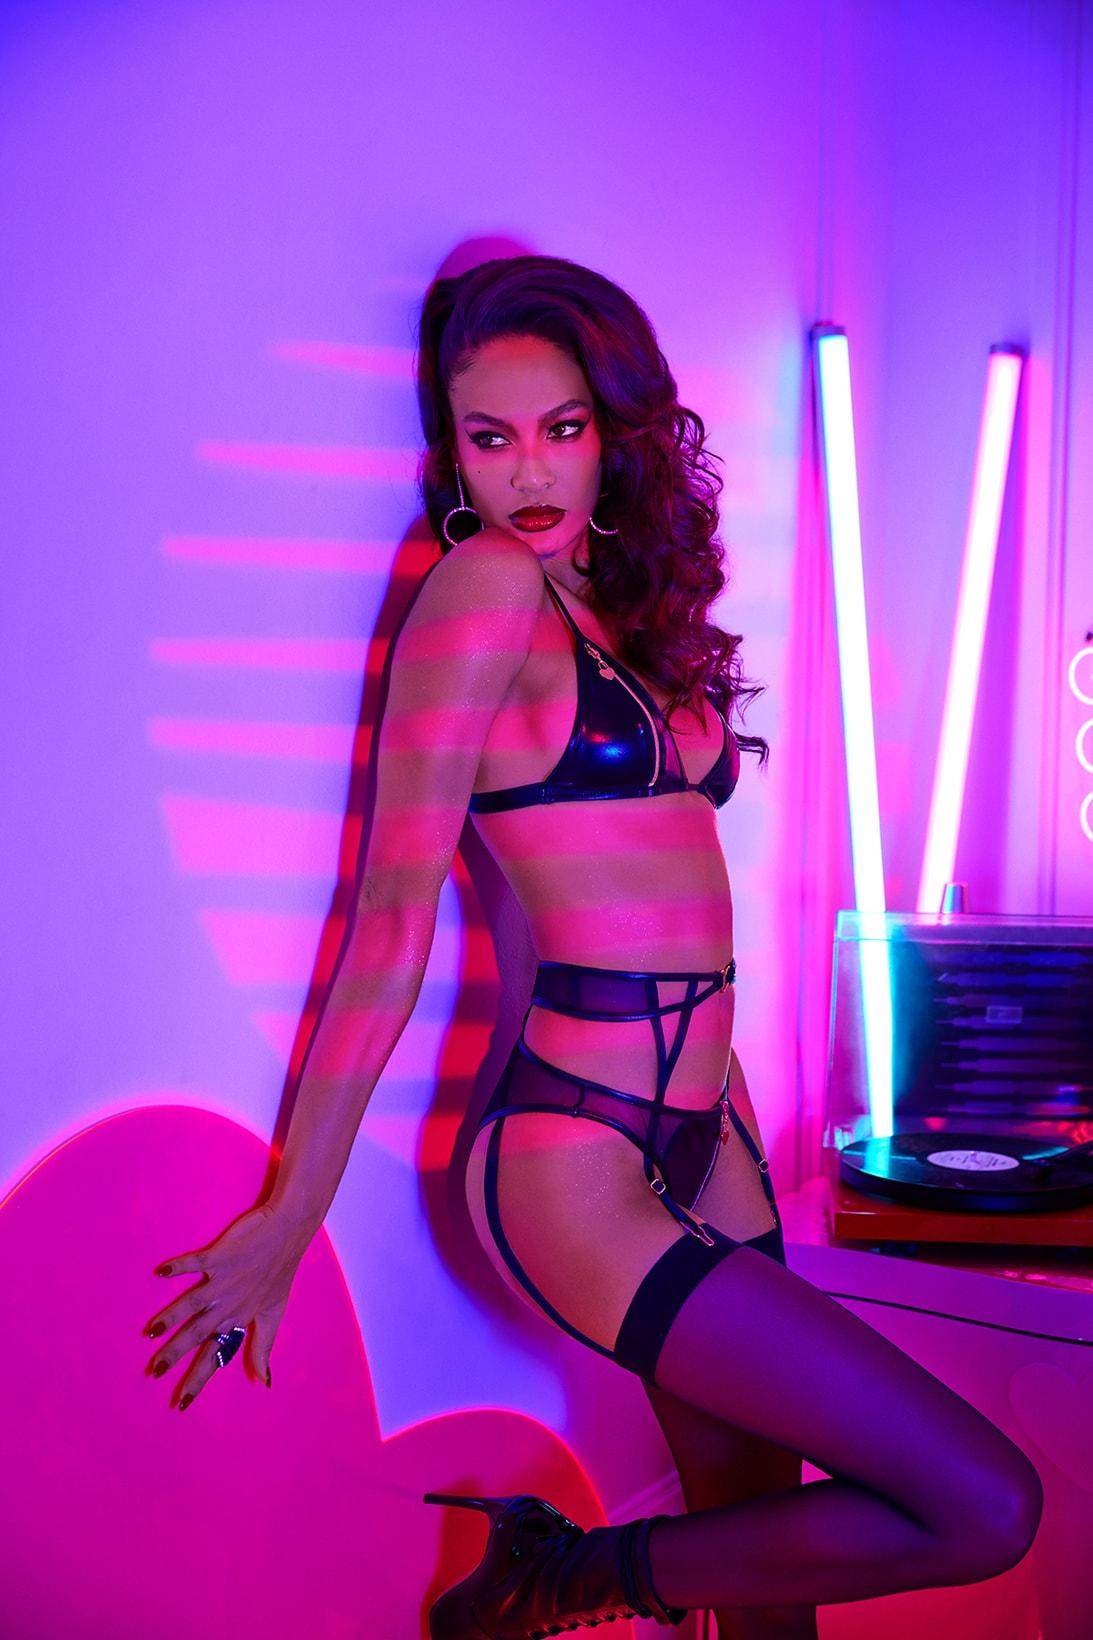 rihanna savage x fenty adam selman collaboration valentines day lingerie bras underwear campaignjoan smalls Paloma Elsesser adesuwa fiffany models